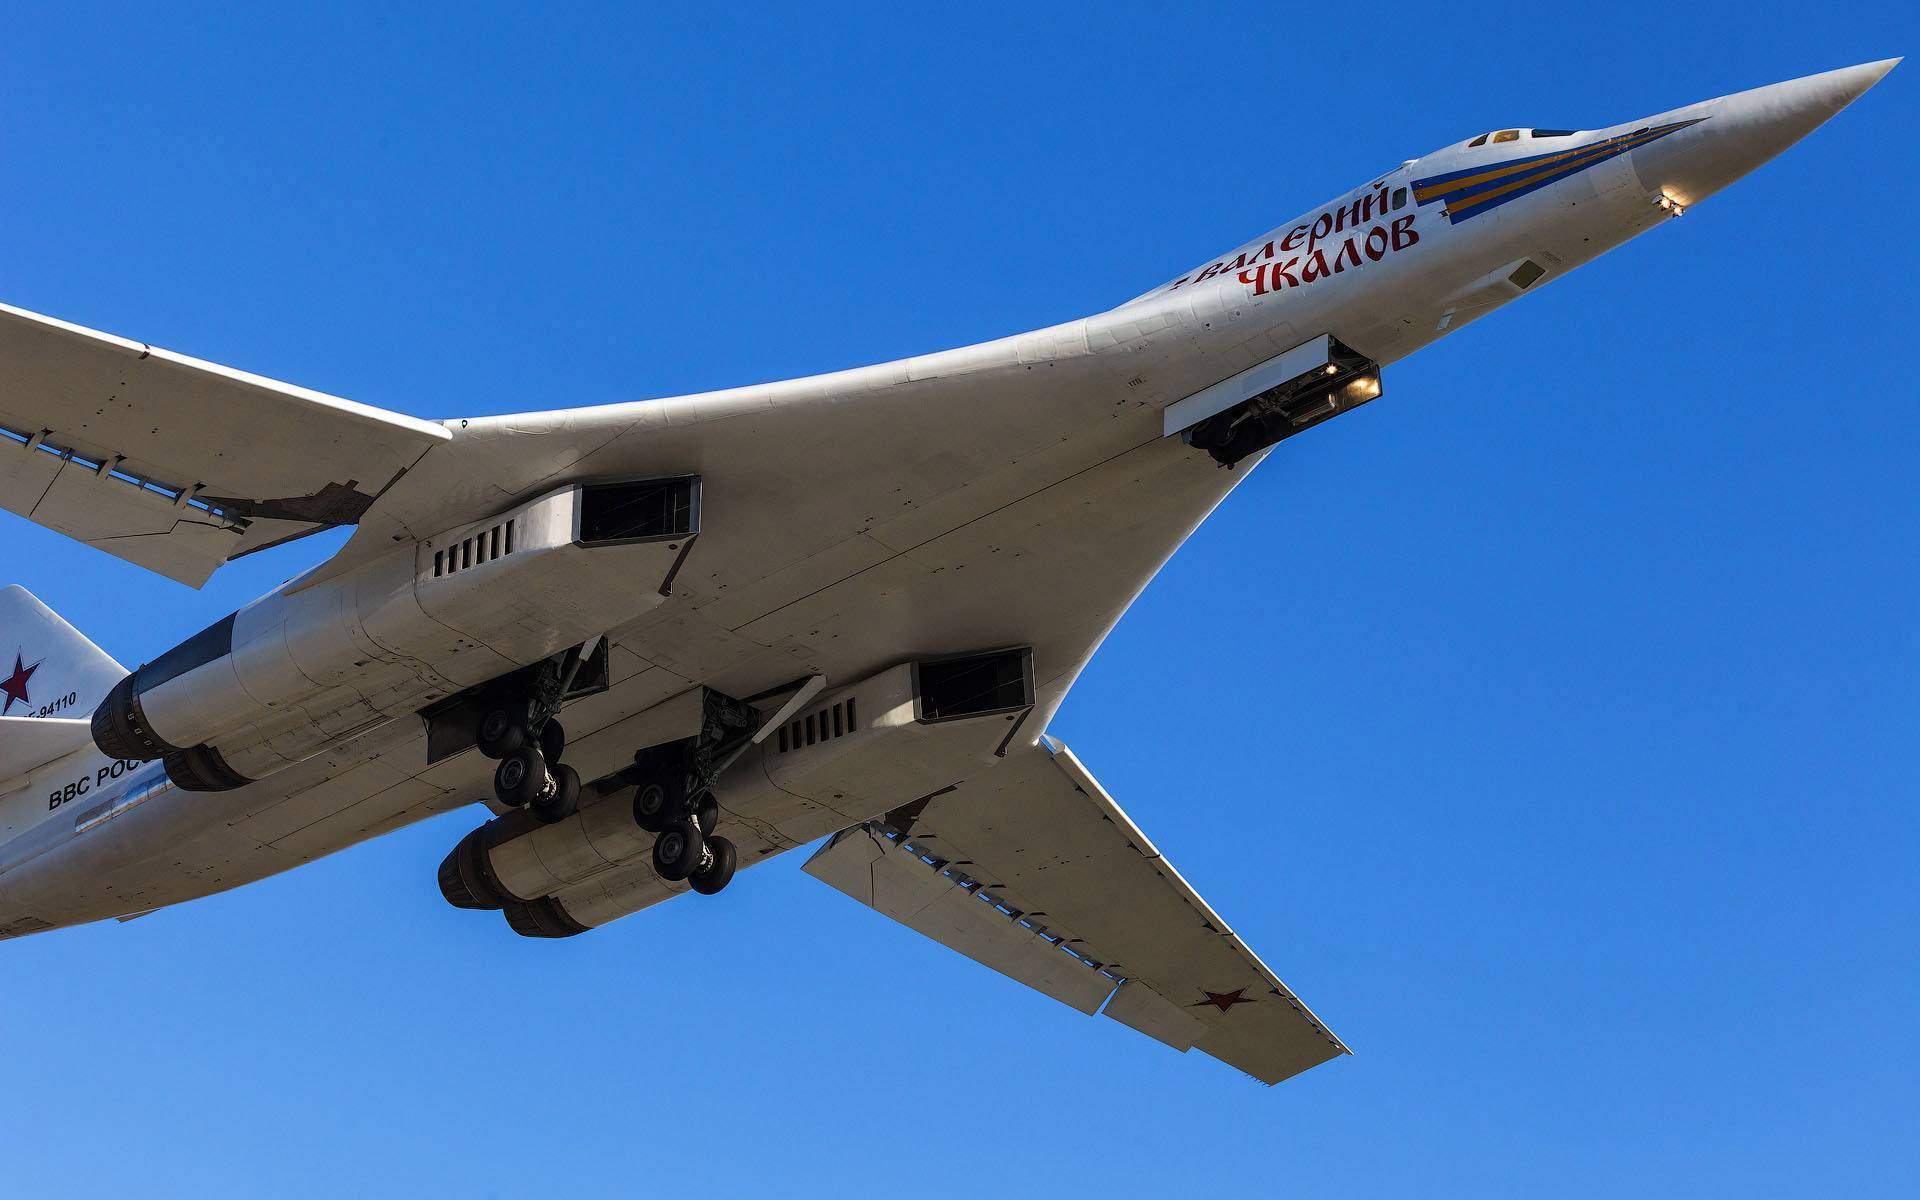 Ту-160. белый лебедь. фото. характеристики.